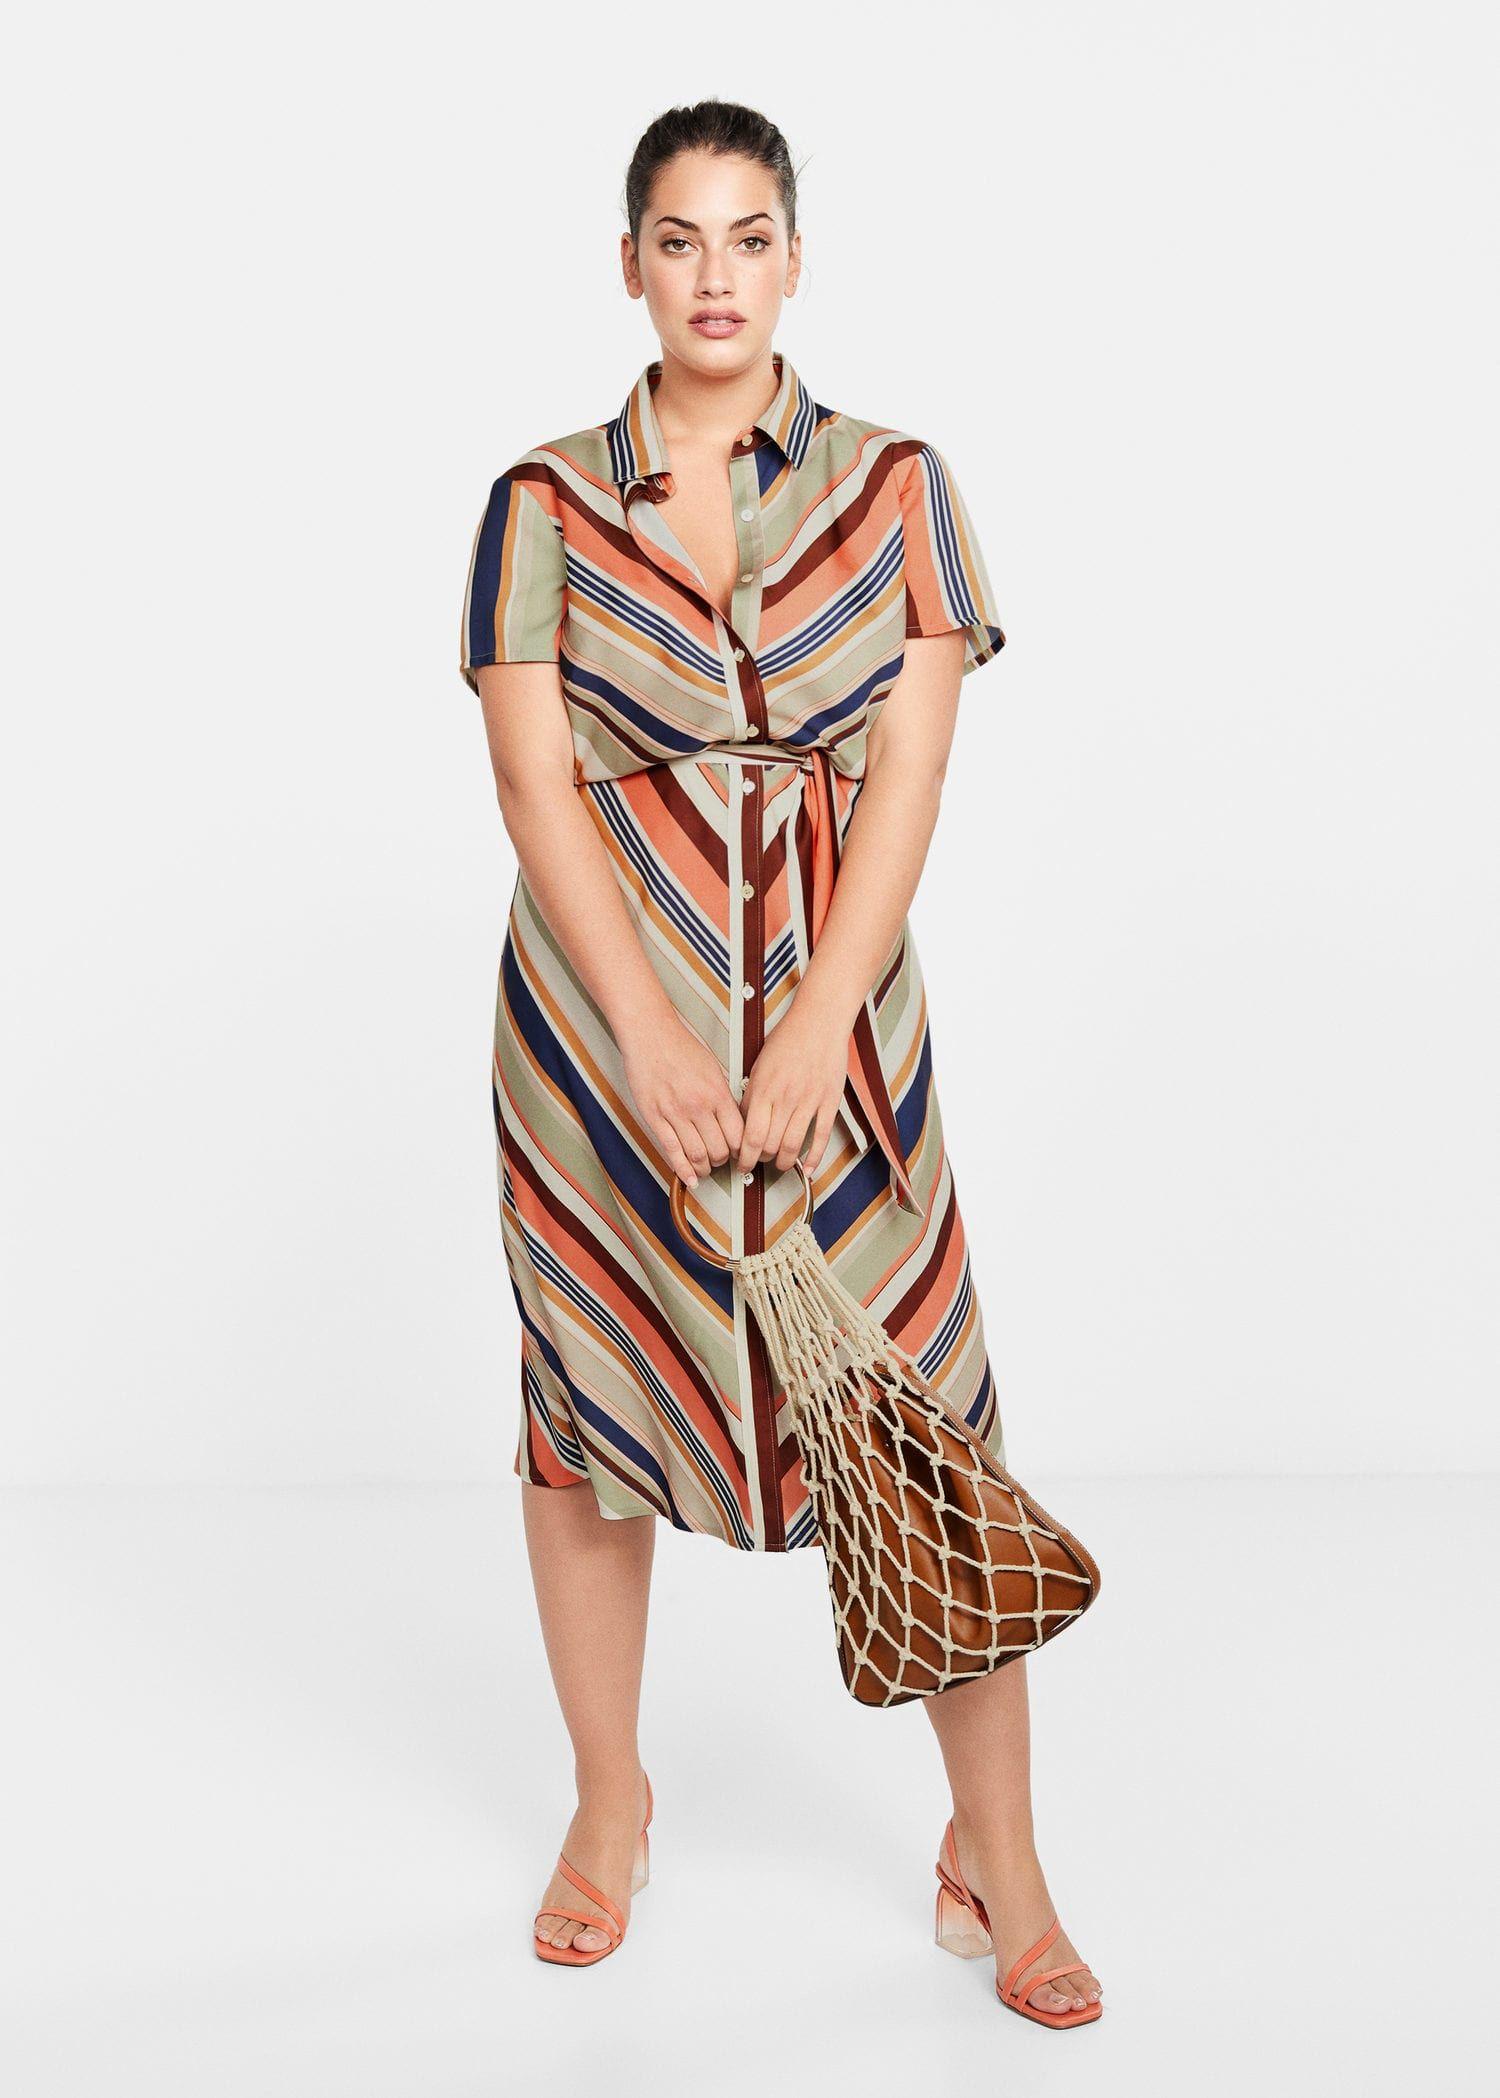 Vestido Midi Rayas Tallas Grandes Violeta By Mango Espana Sommer Kleider Kleid Plus Grossen Midikleider